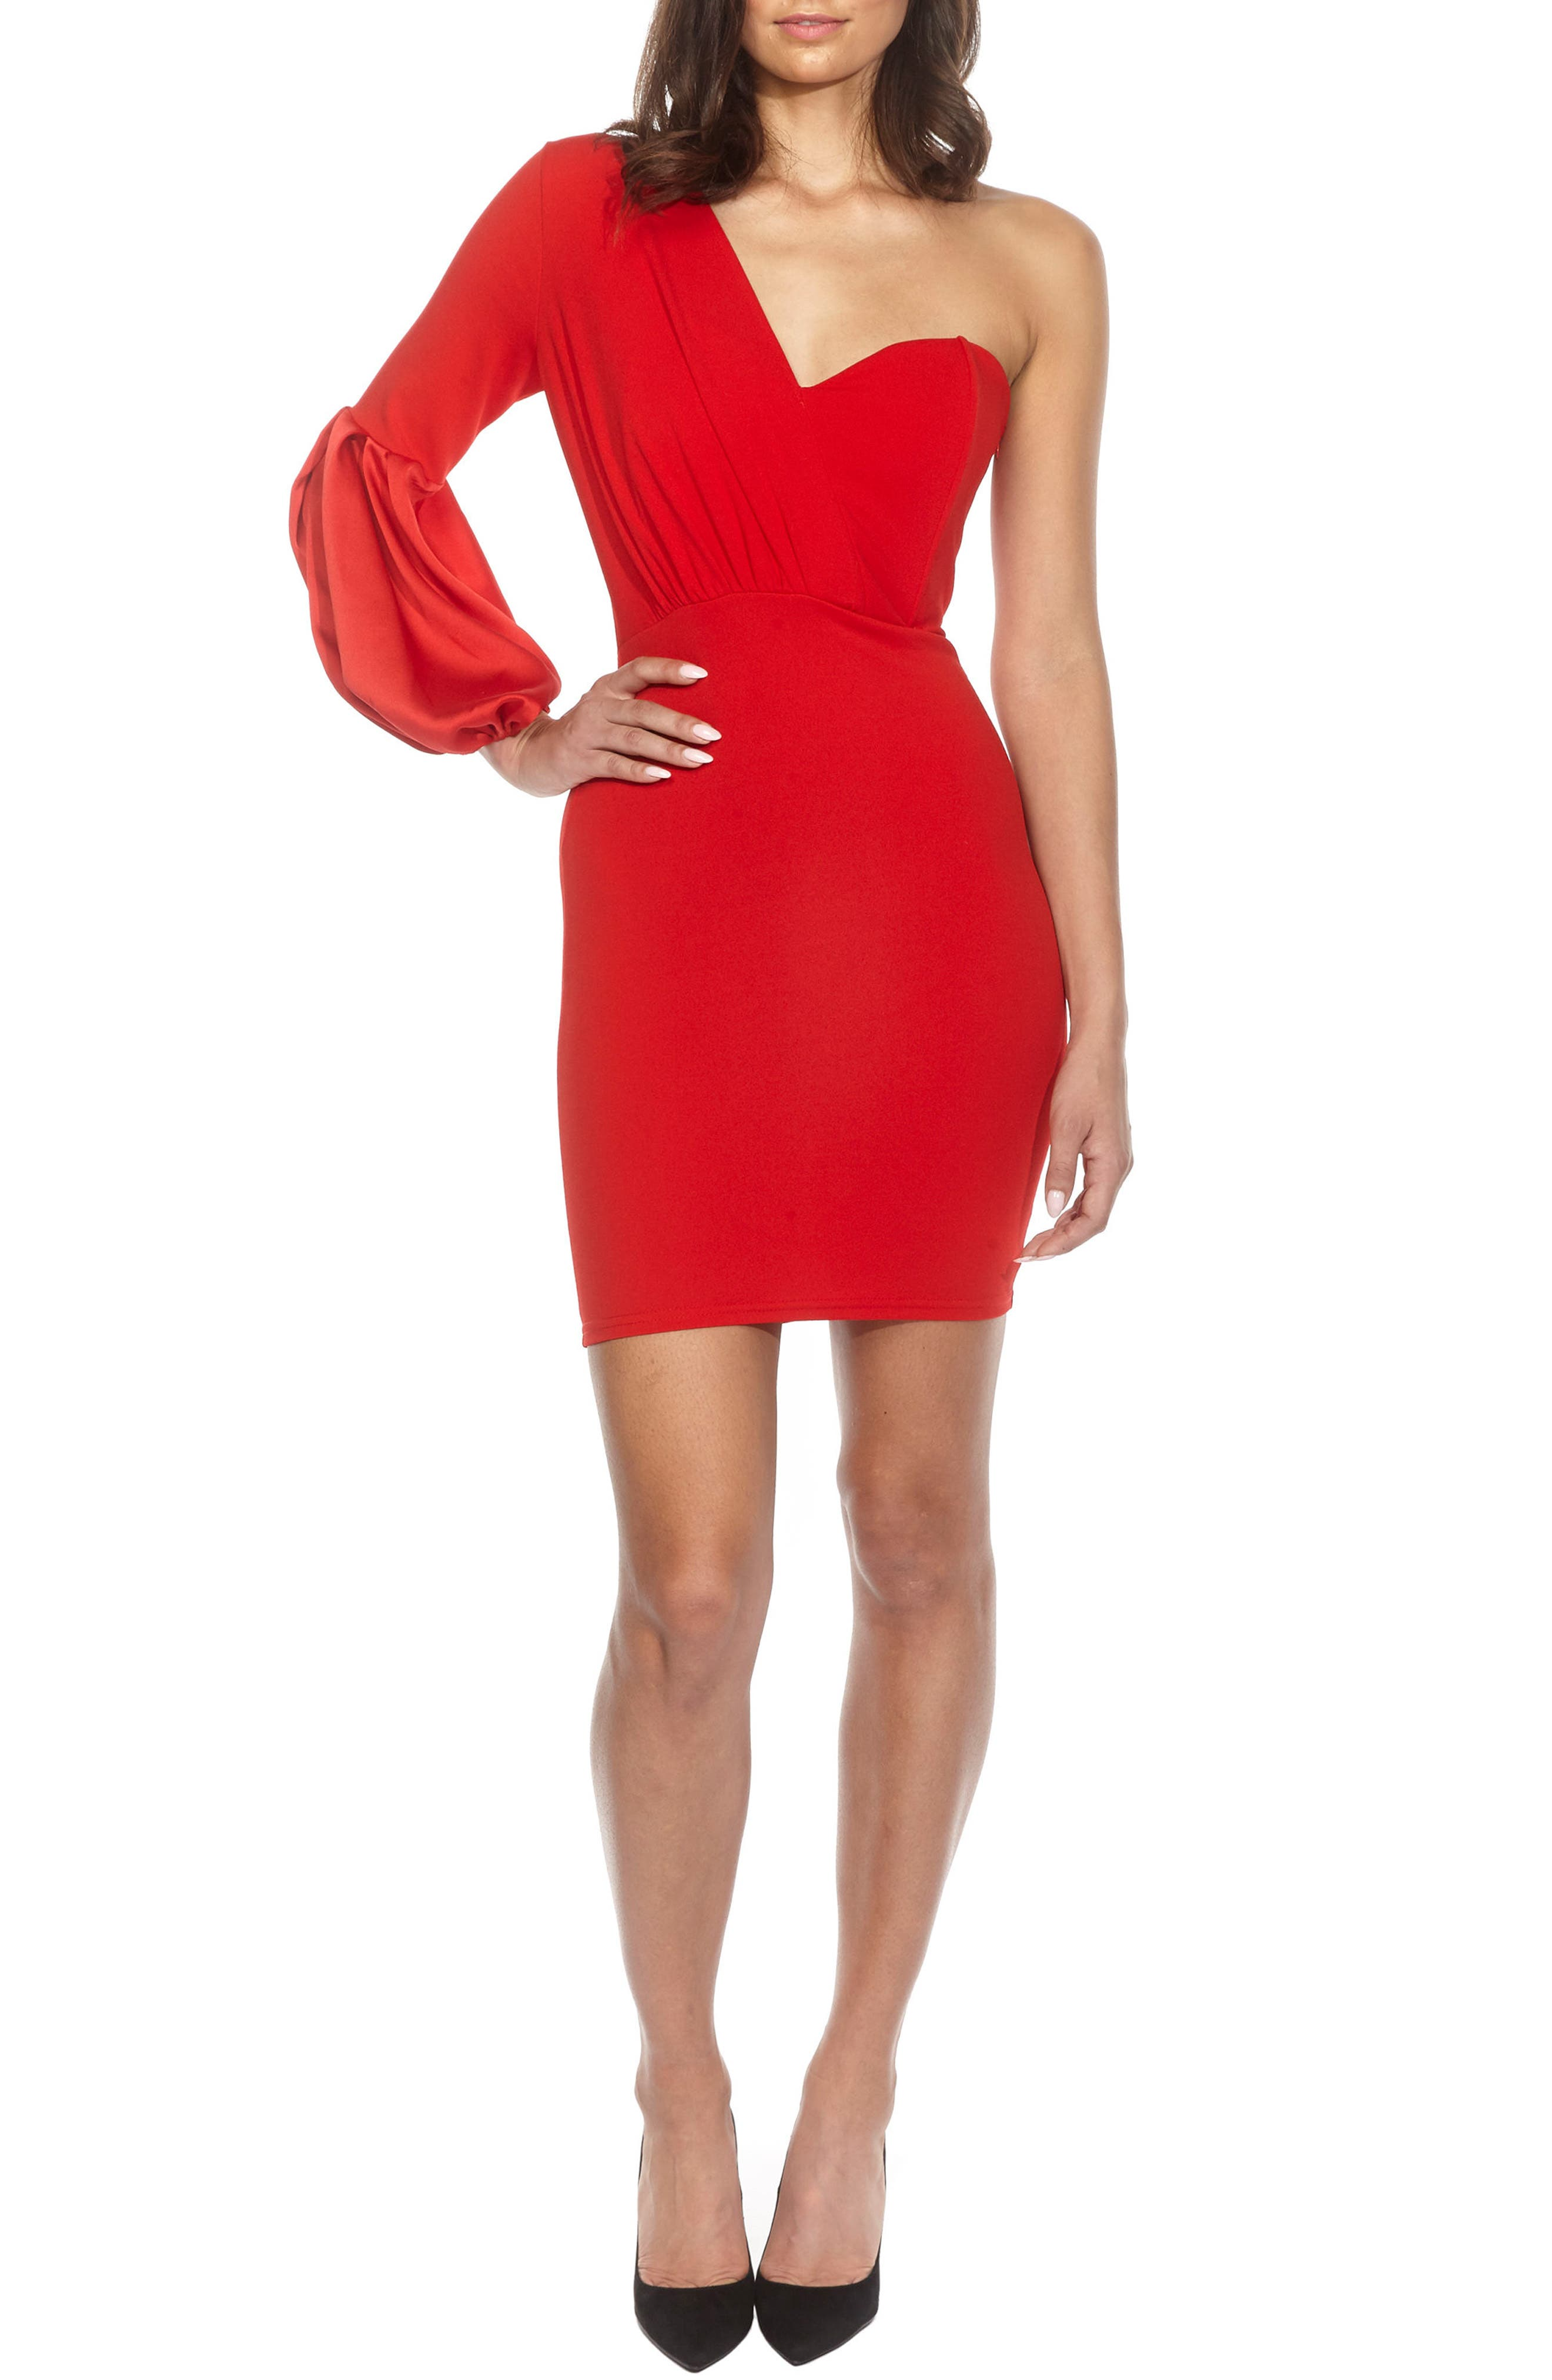 Naeva One-Shoulder Minidress,                         Main,                         color, 610